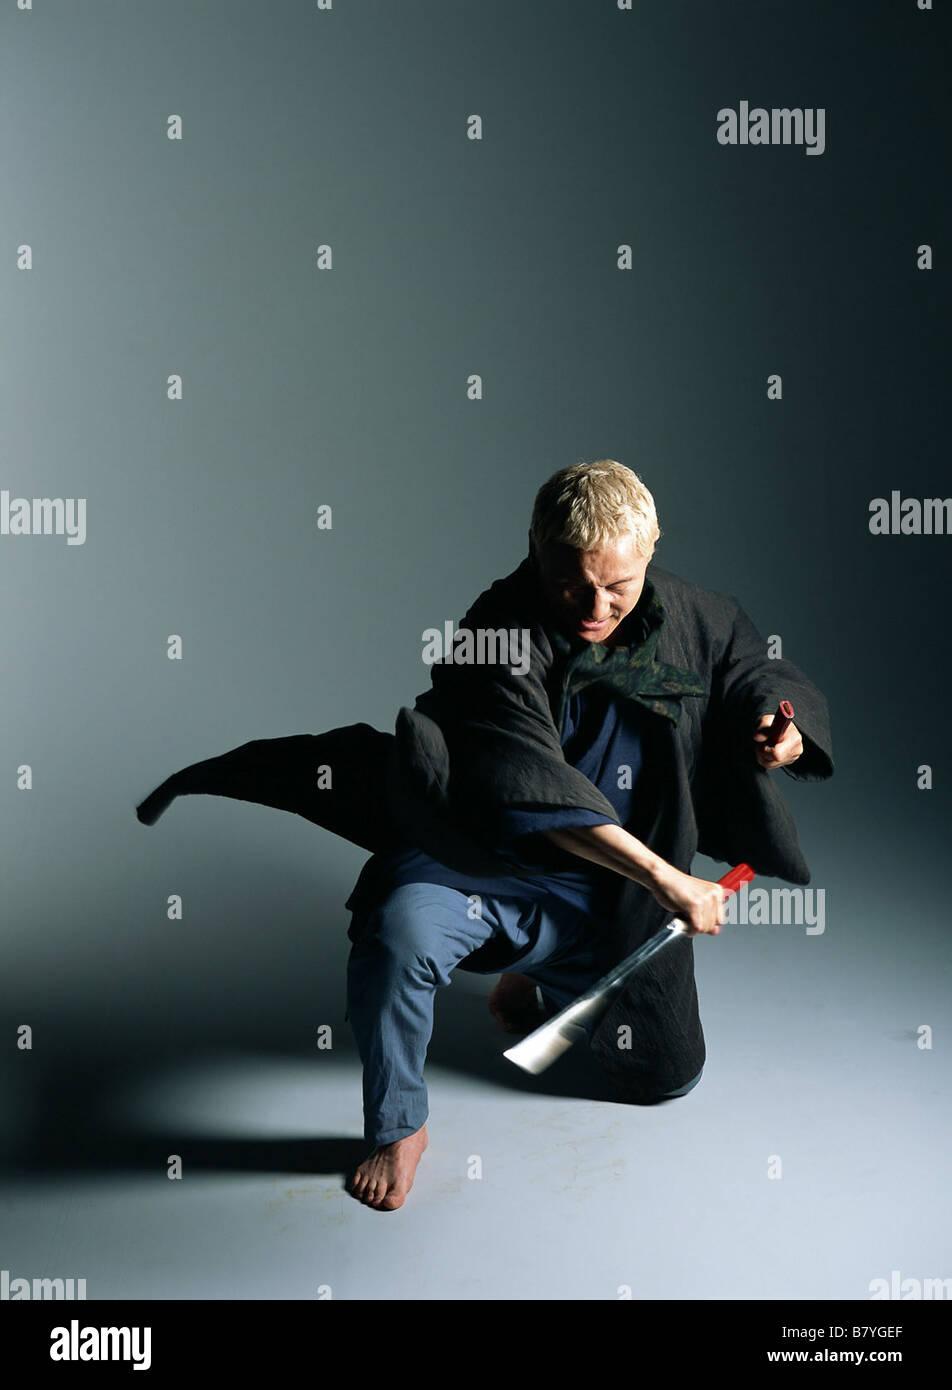 Takeshi Kitano Takeshi Kitano Takeshi Kitano sur le tournage on the set The Blind Swordsman: Zatoichi / Zatôichi - Stock Image